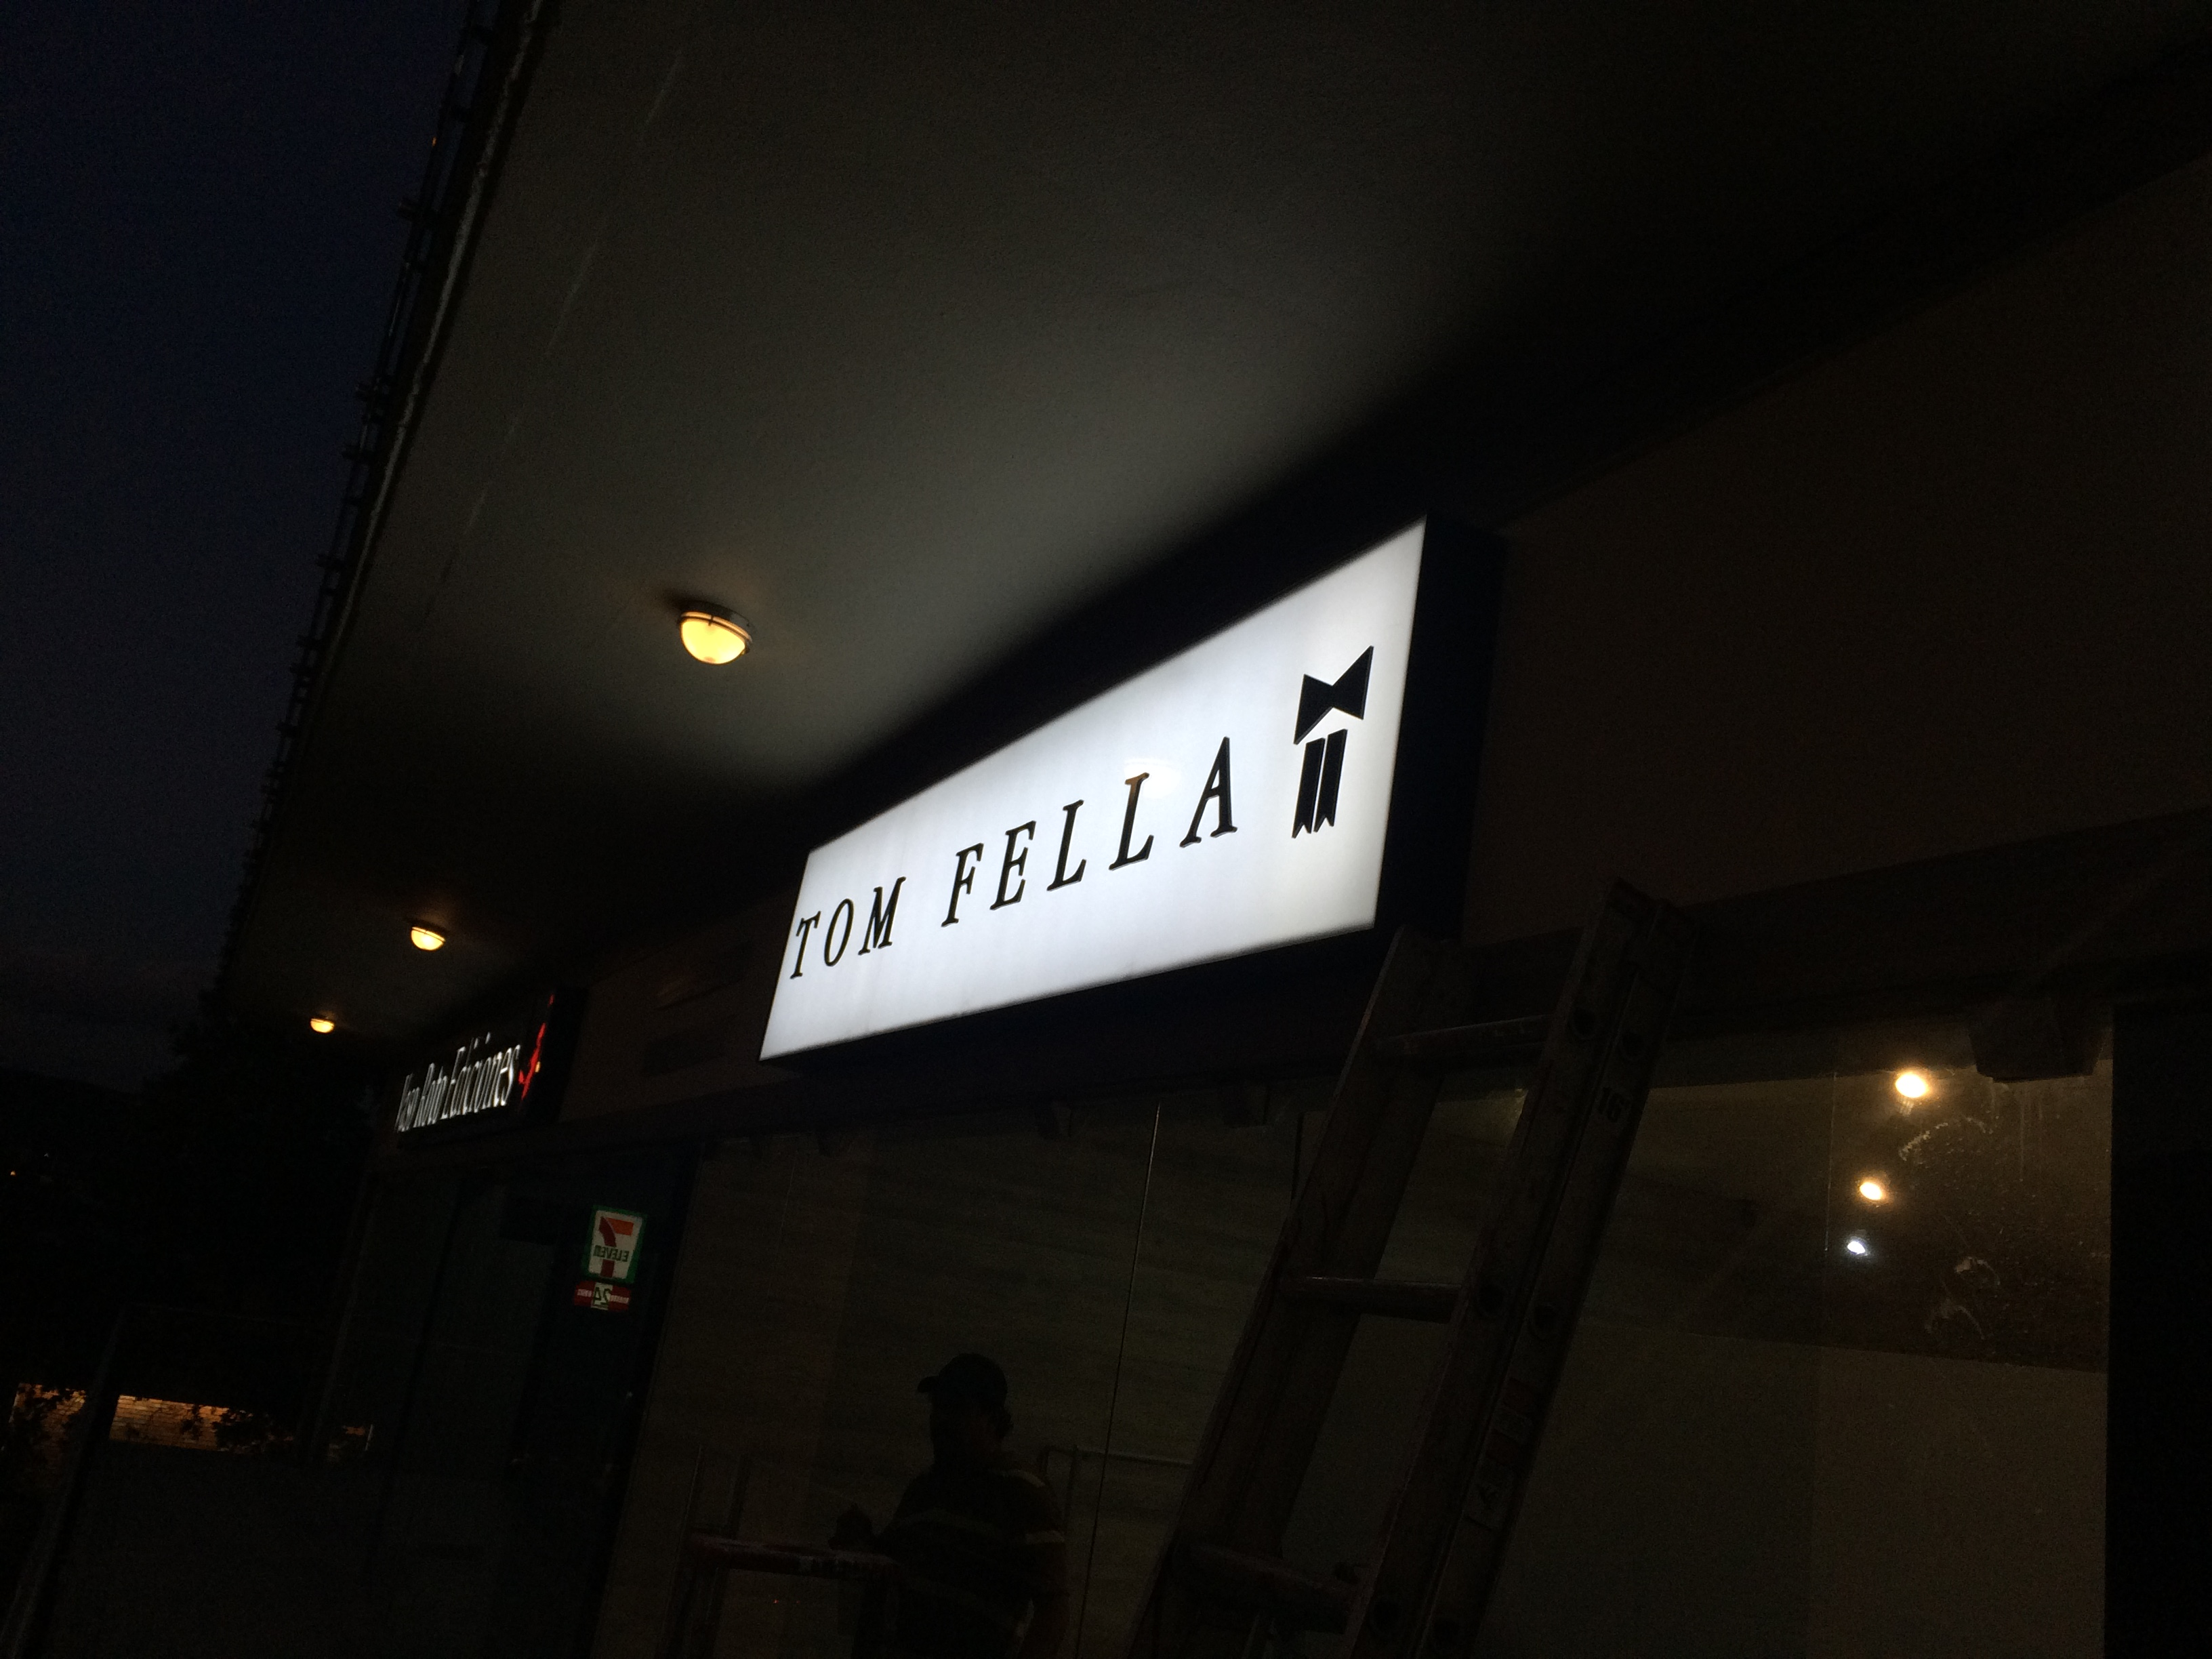 Tom Fella